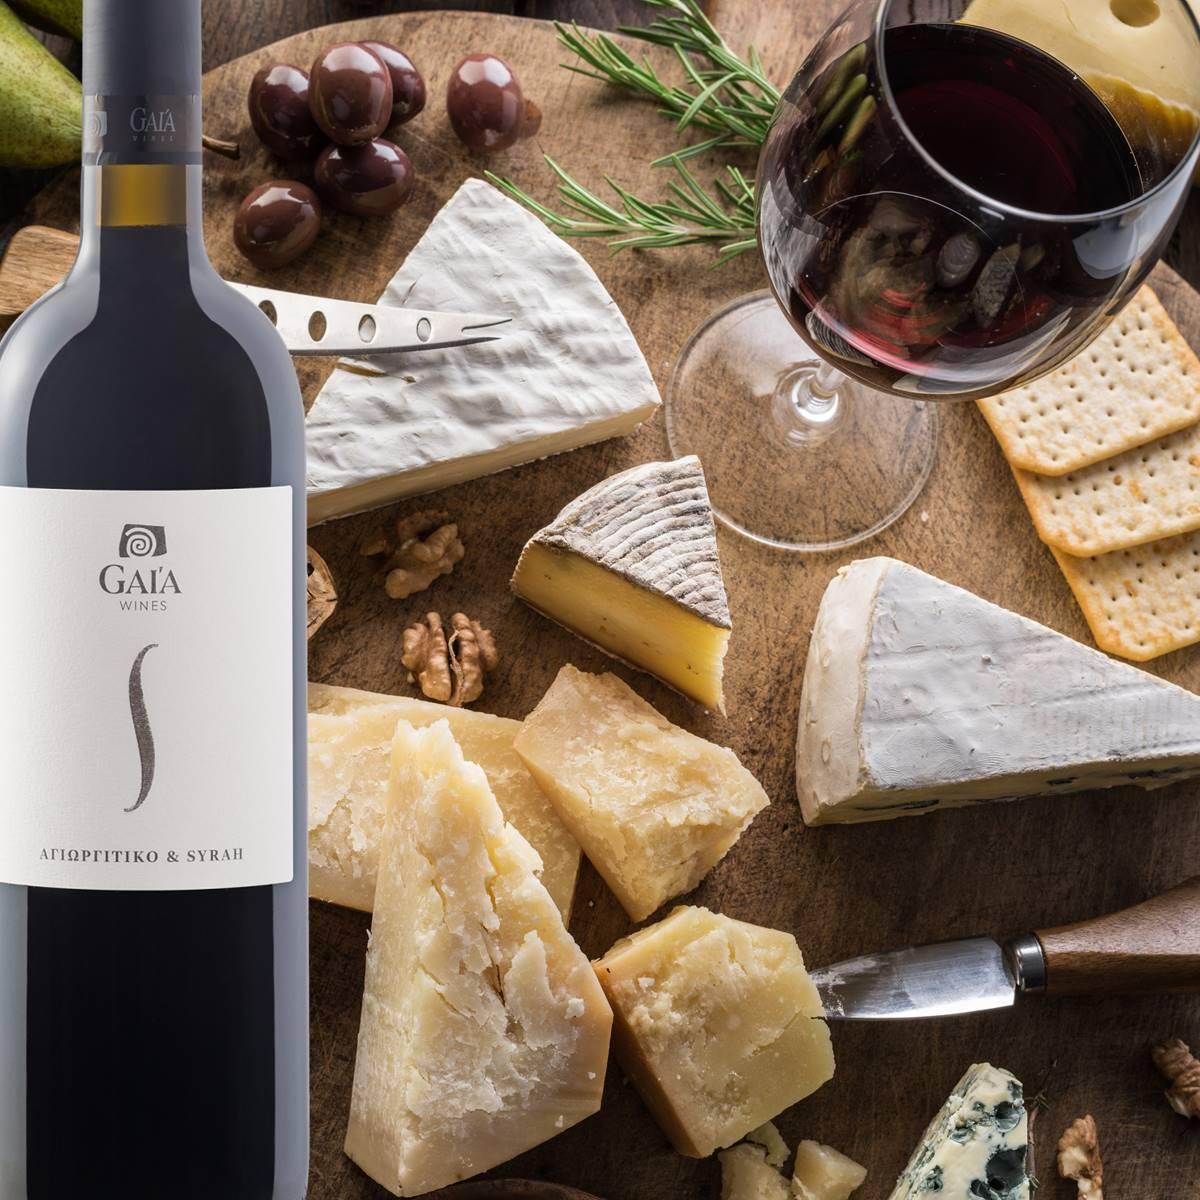 Wine Pairing Γαίας S, Κόκκινο - Gaia Wines